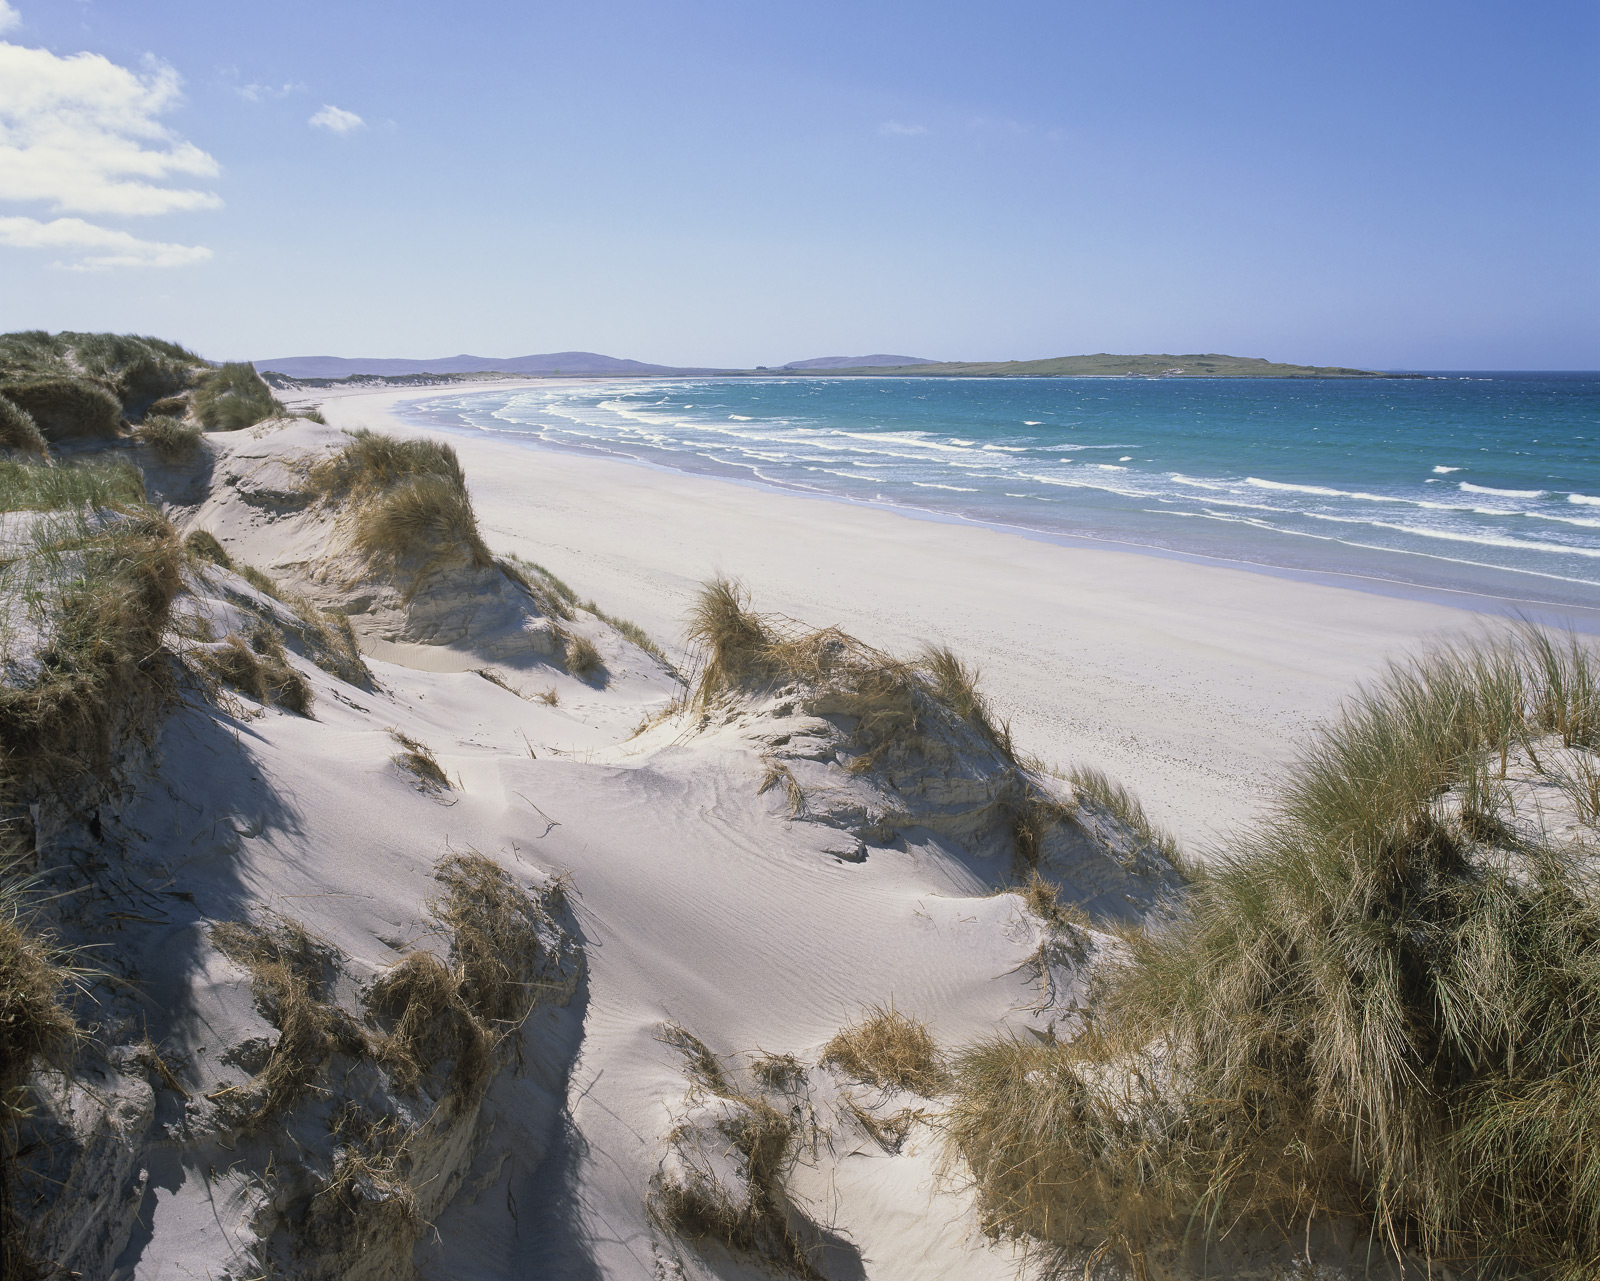 Dune Erosion, Traigh Lar, North Uist, Scotland, best, beaches, magnificent, dazzling, white, coral, sand, collapse, dune, photo